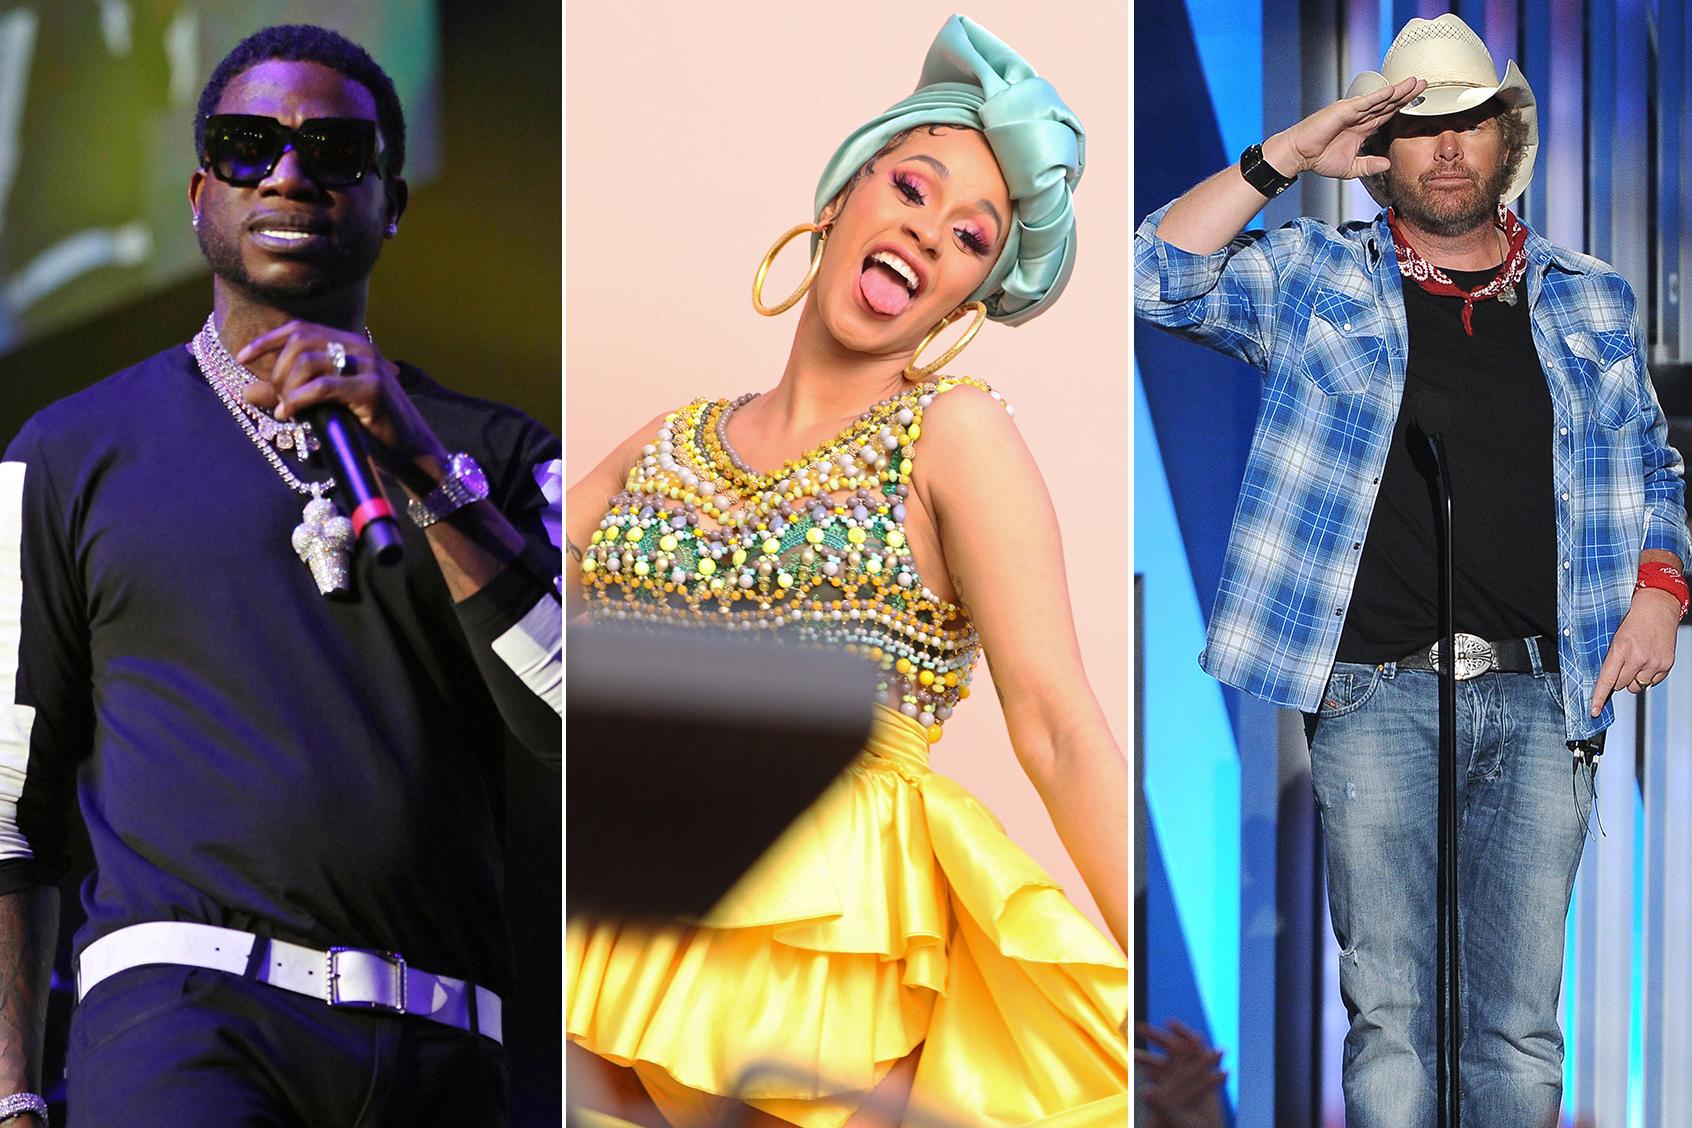 Cardi B, Sammy Hagar, Gucci Mane, Toby Keith to Headline Arkansas